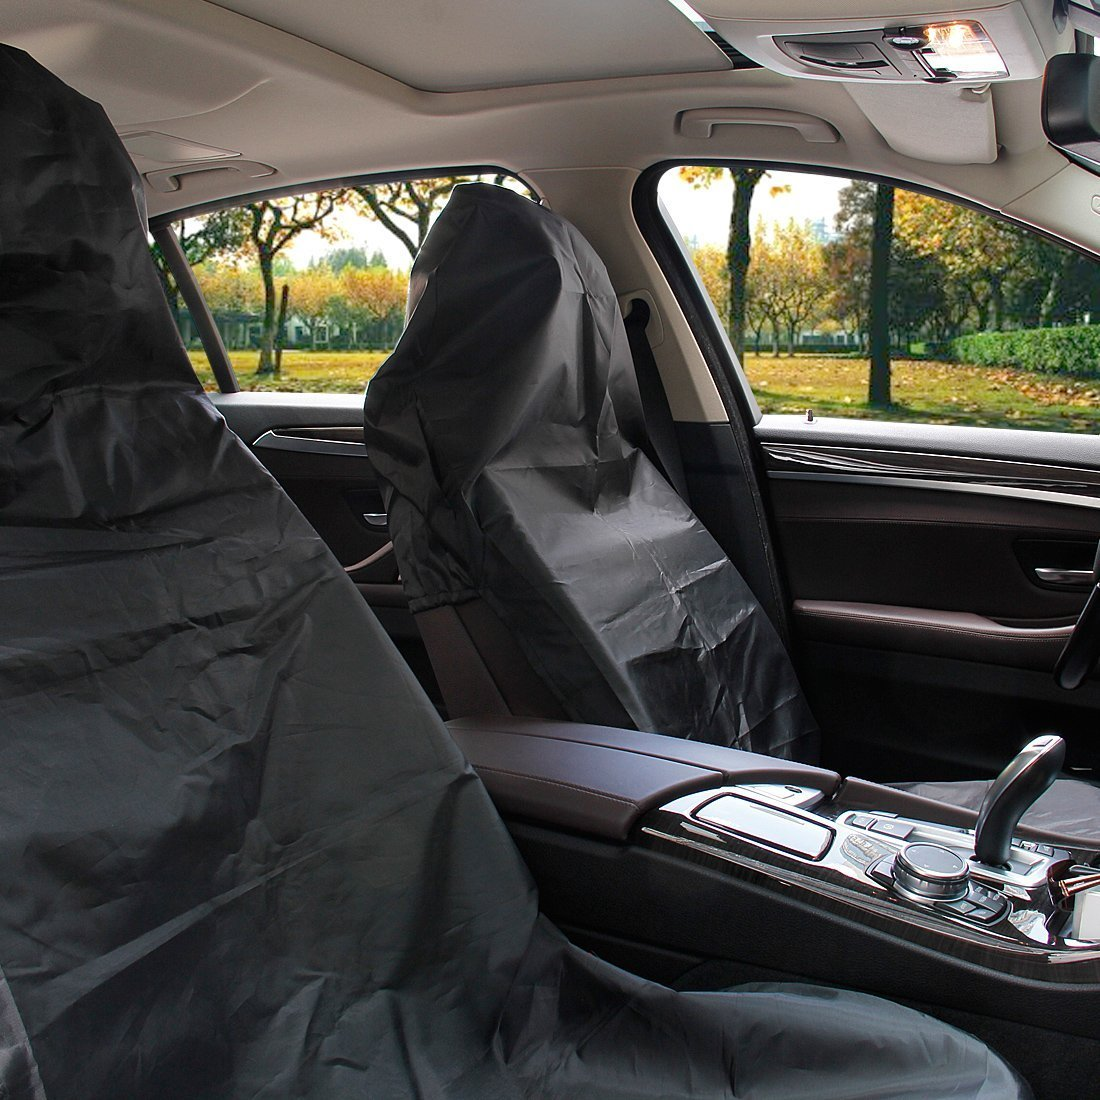 One Black Tough Waterproof Car Seat Cover Wipe Clean Protector